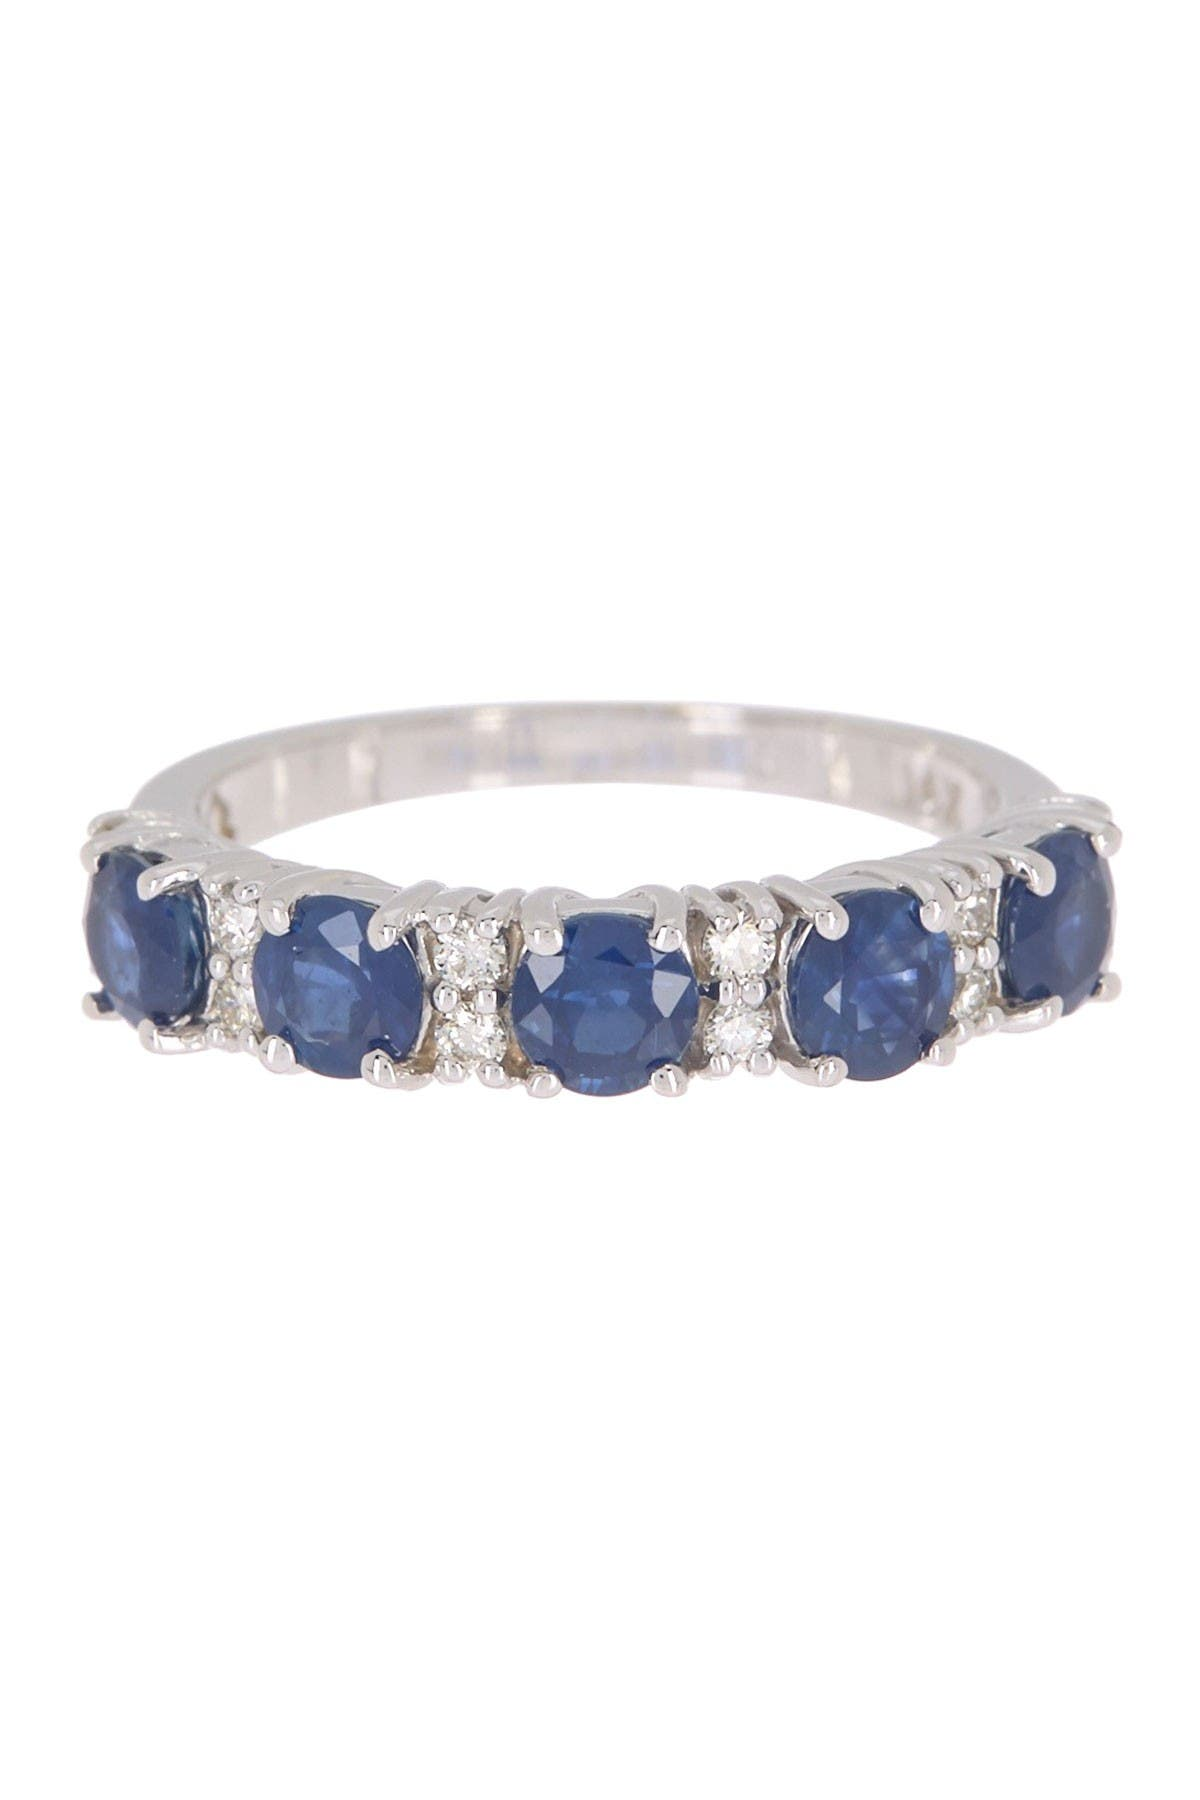 Image of Effy 14K White Gold Prong Set Blue Sapphire & Diamond Accent Ring - Size 7